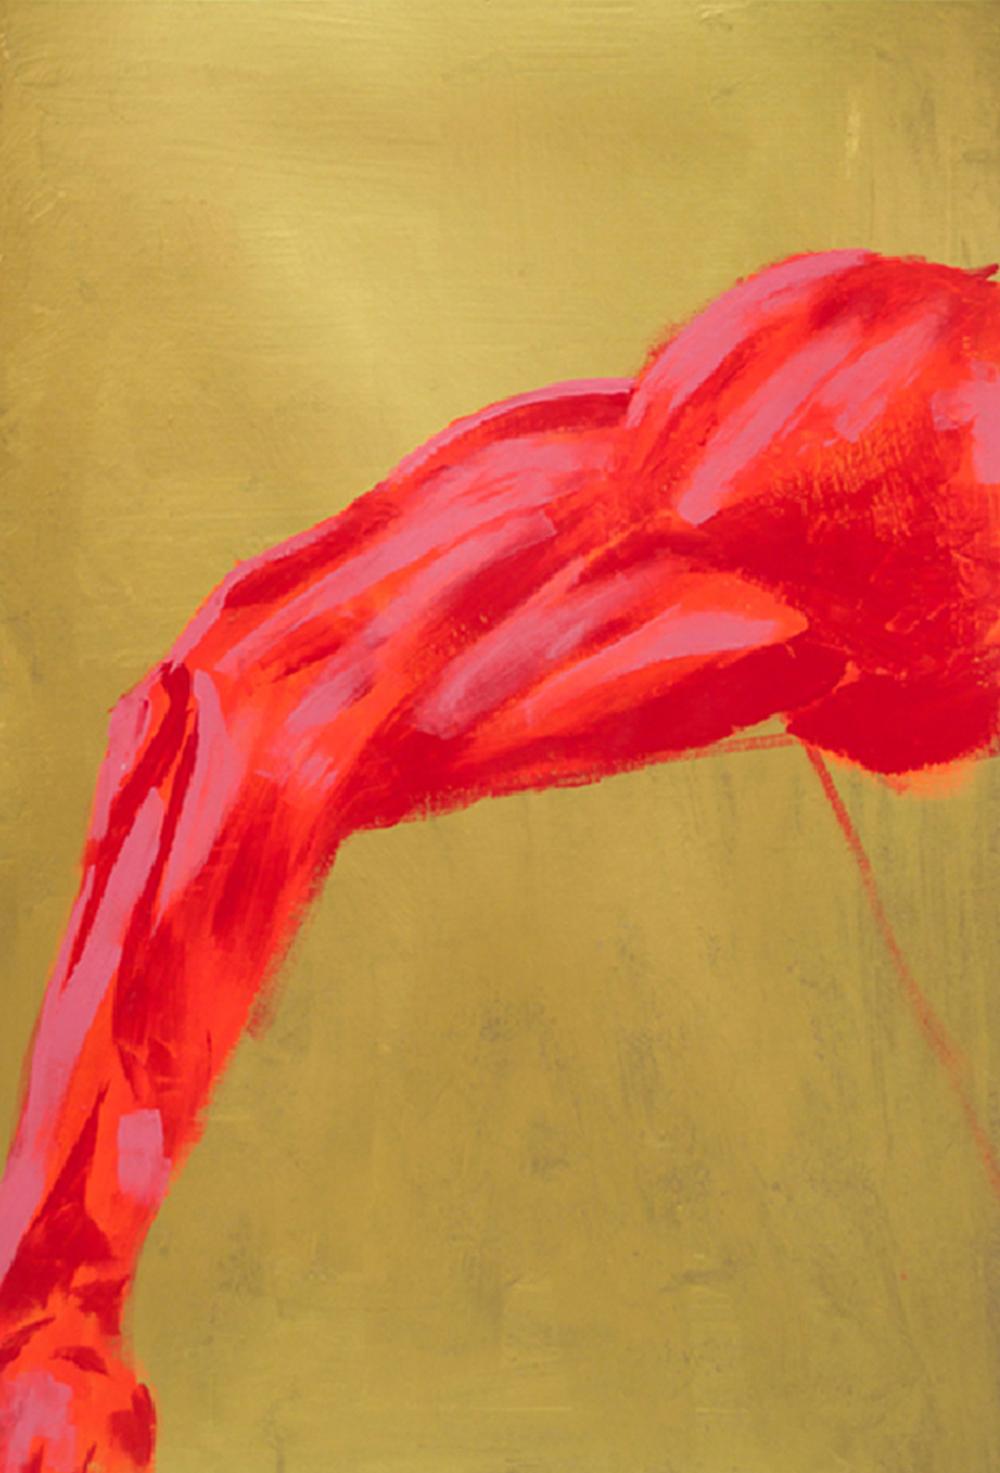 RED ARM.jpg